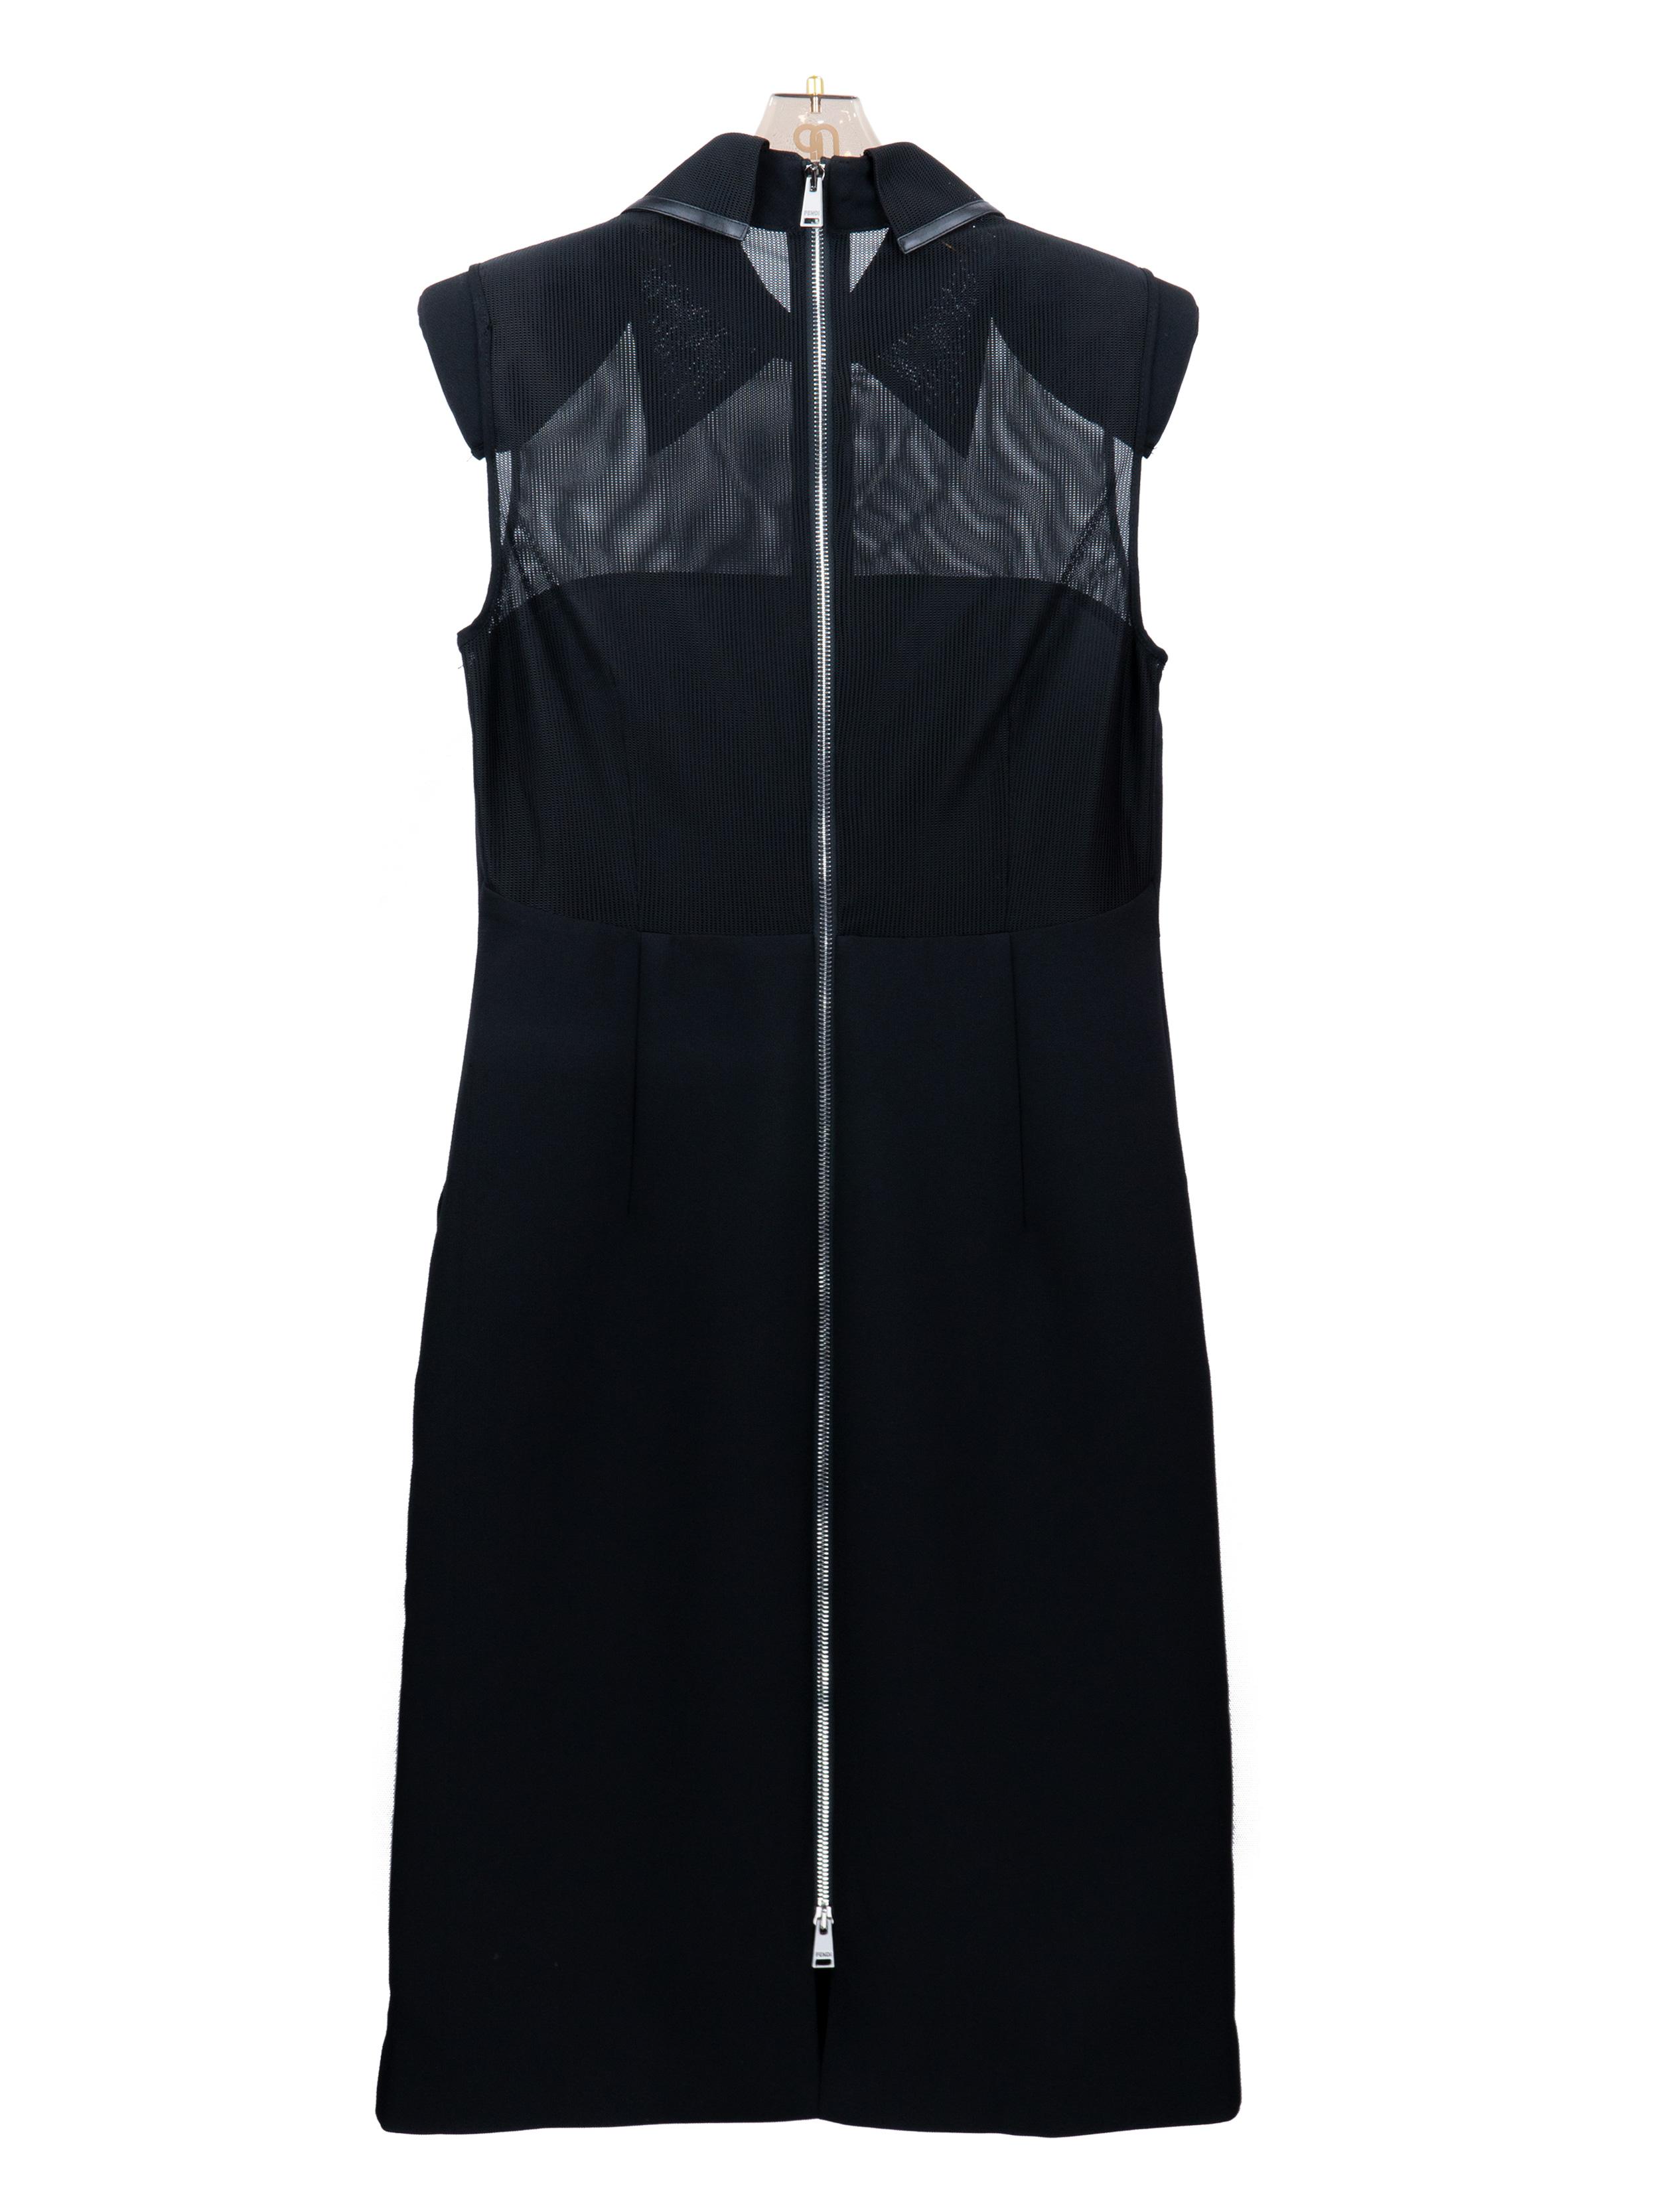 Đầm Zip lưng